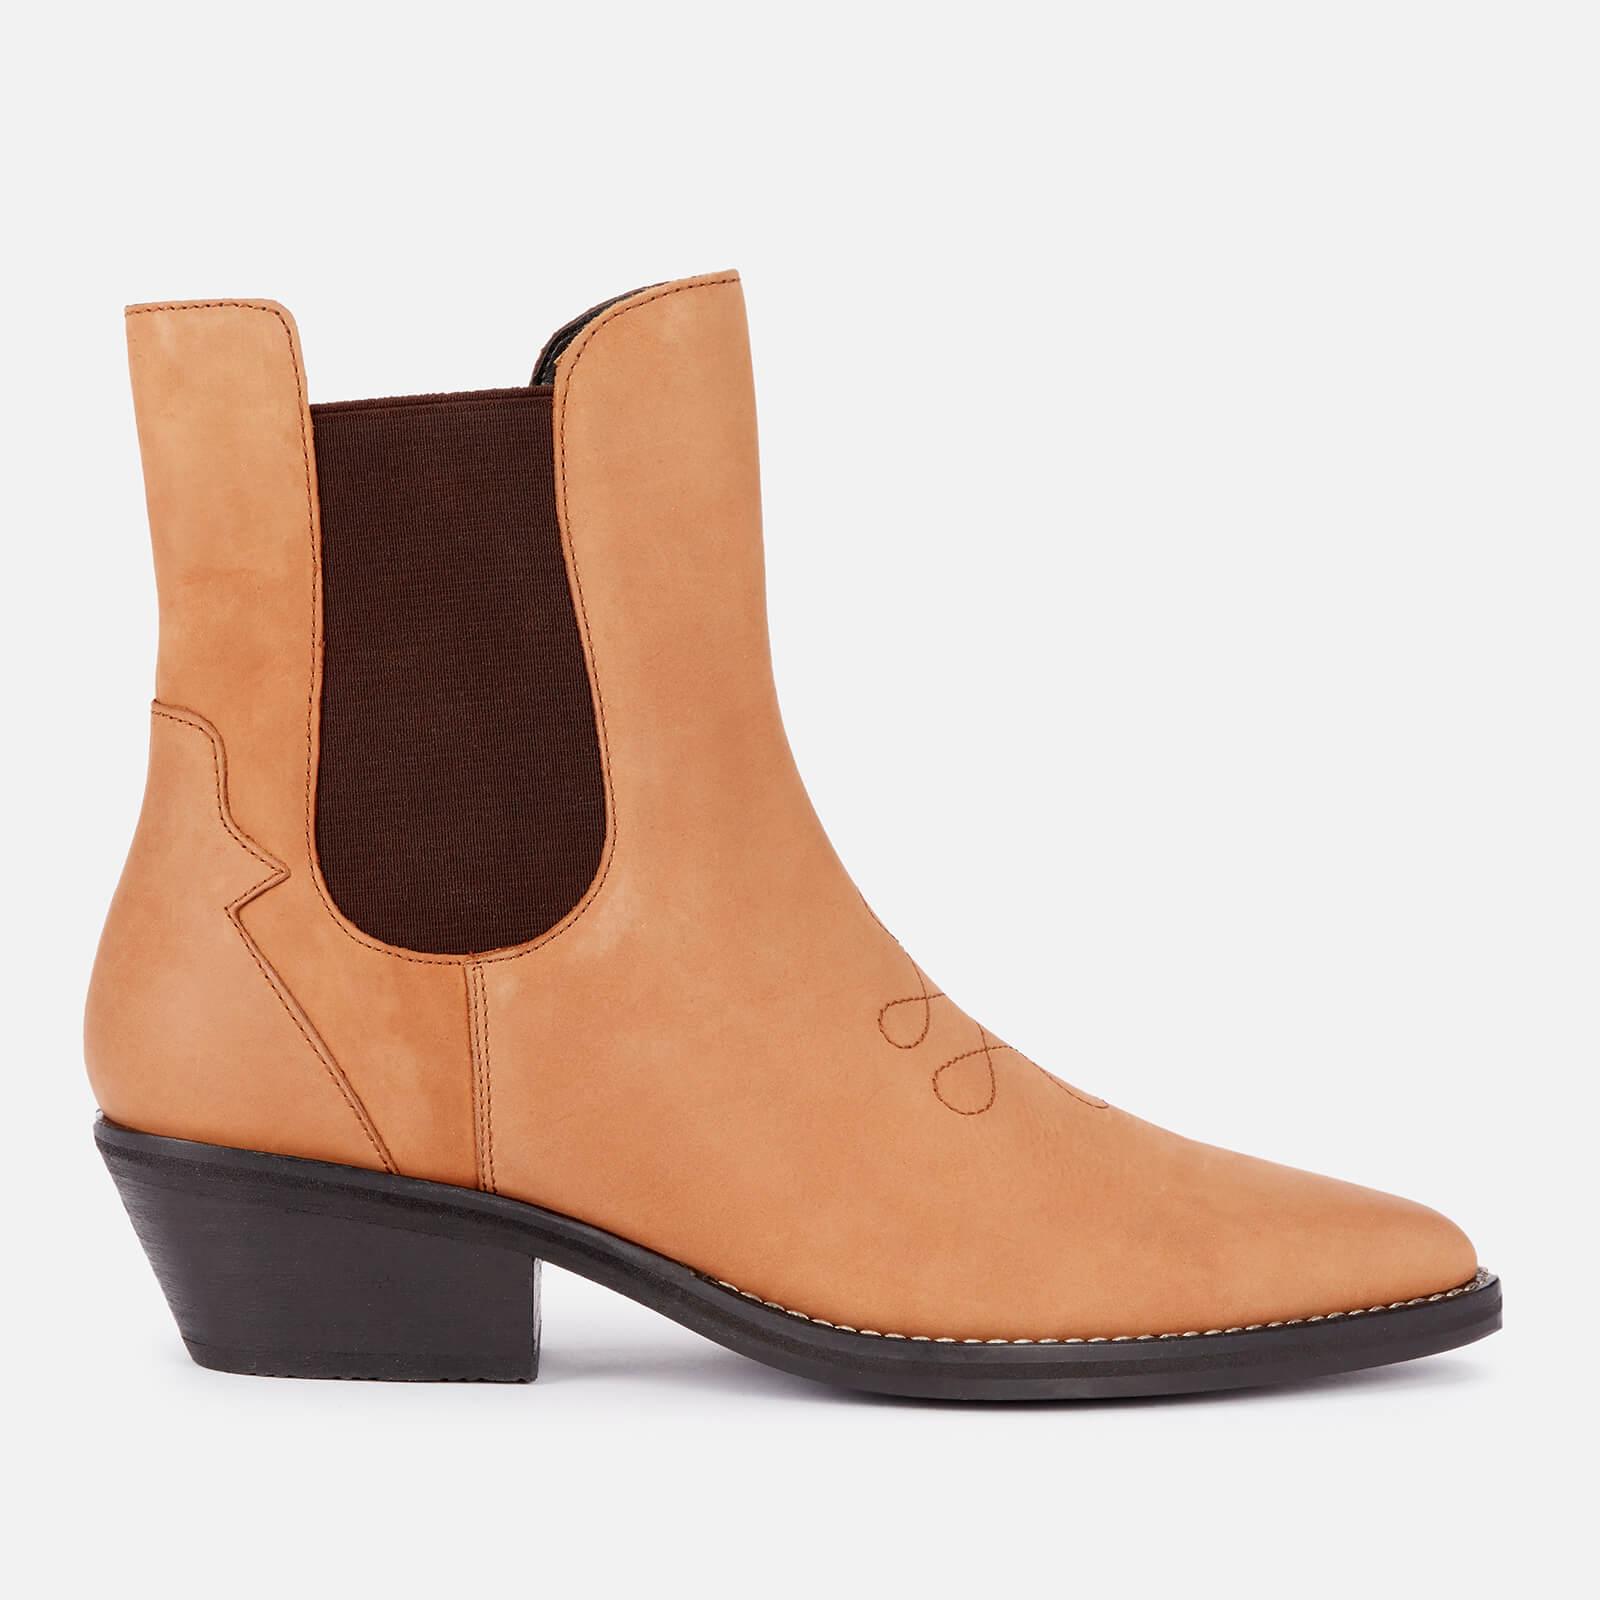 Superdry Women's Western Boots - Tan - Uk 8